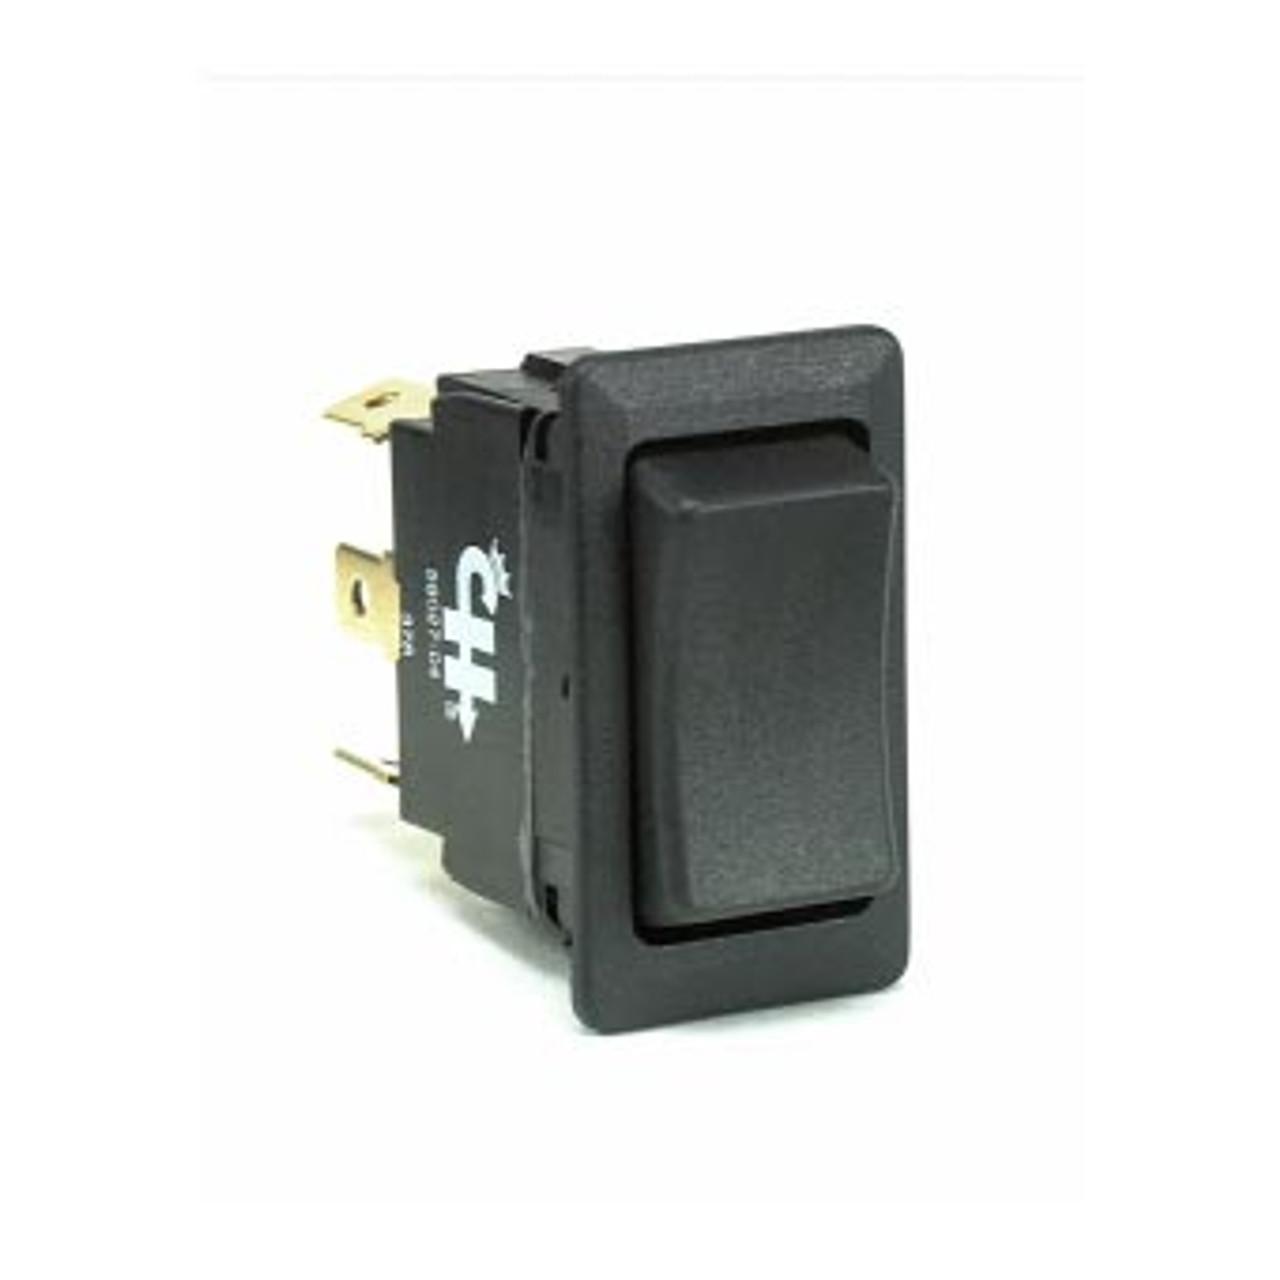 58027-11 Rocker Switch On-Off-On, DPDT 6 Blade Terminals